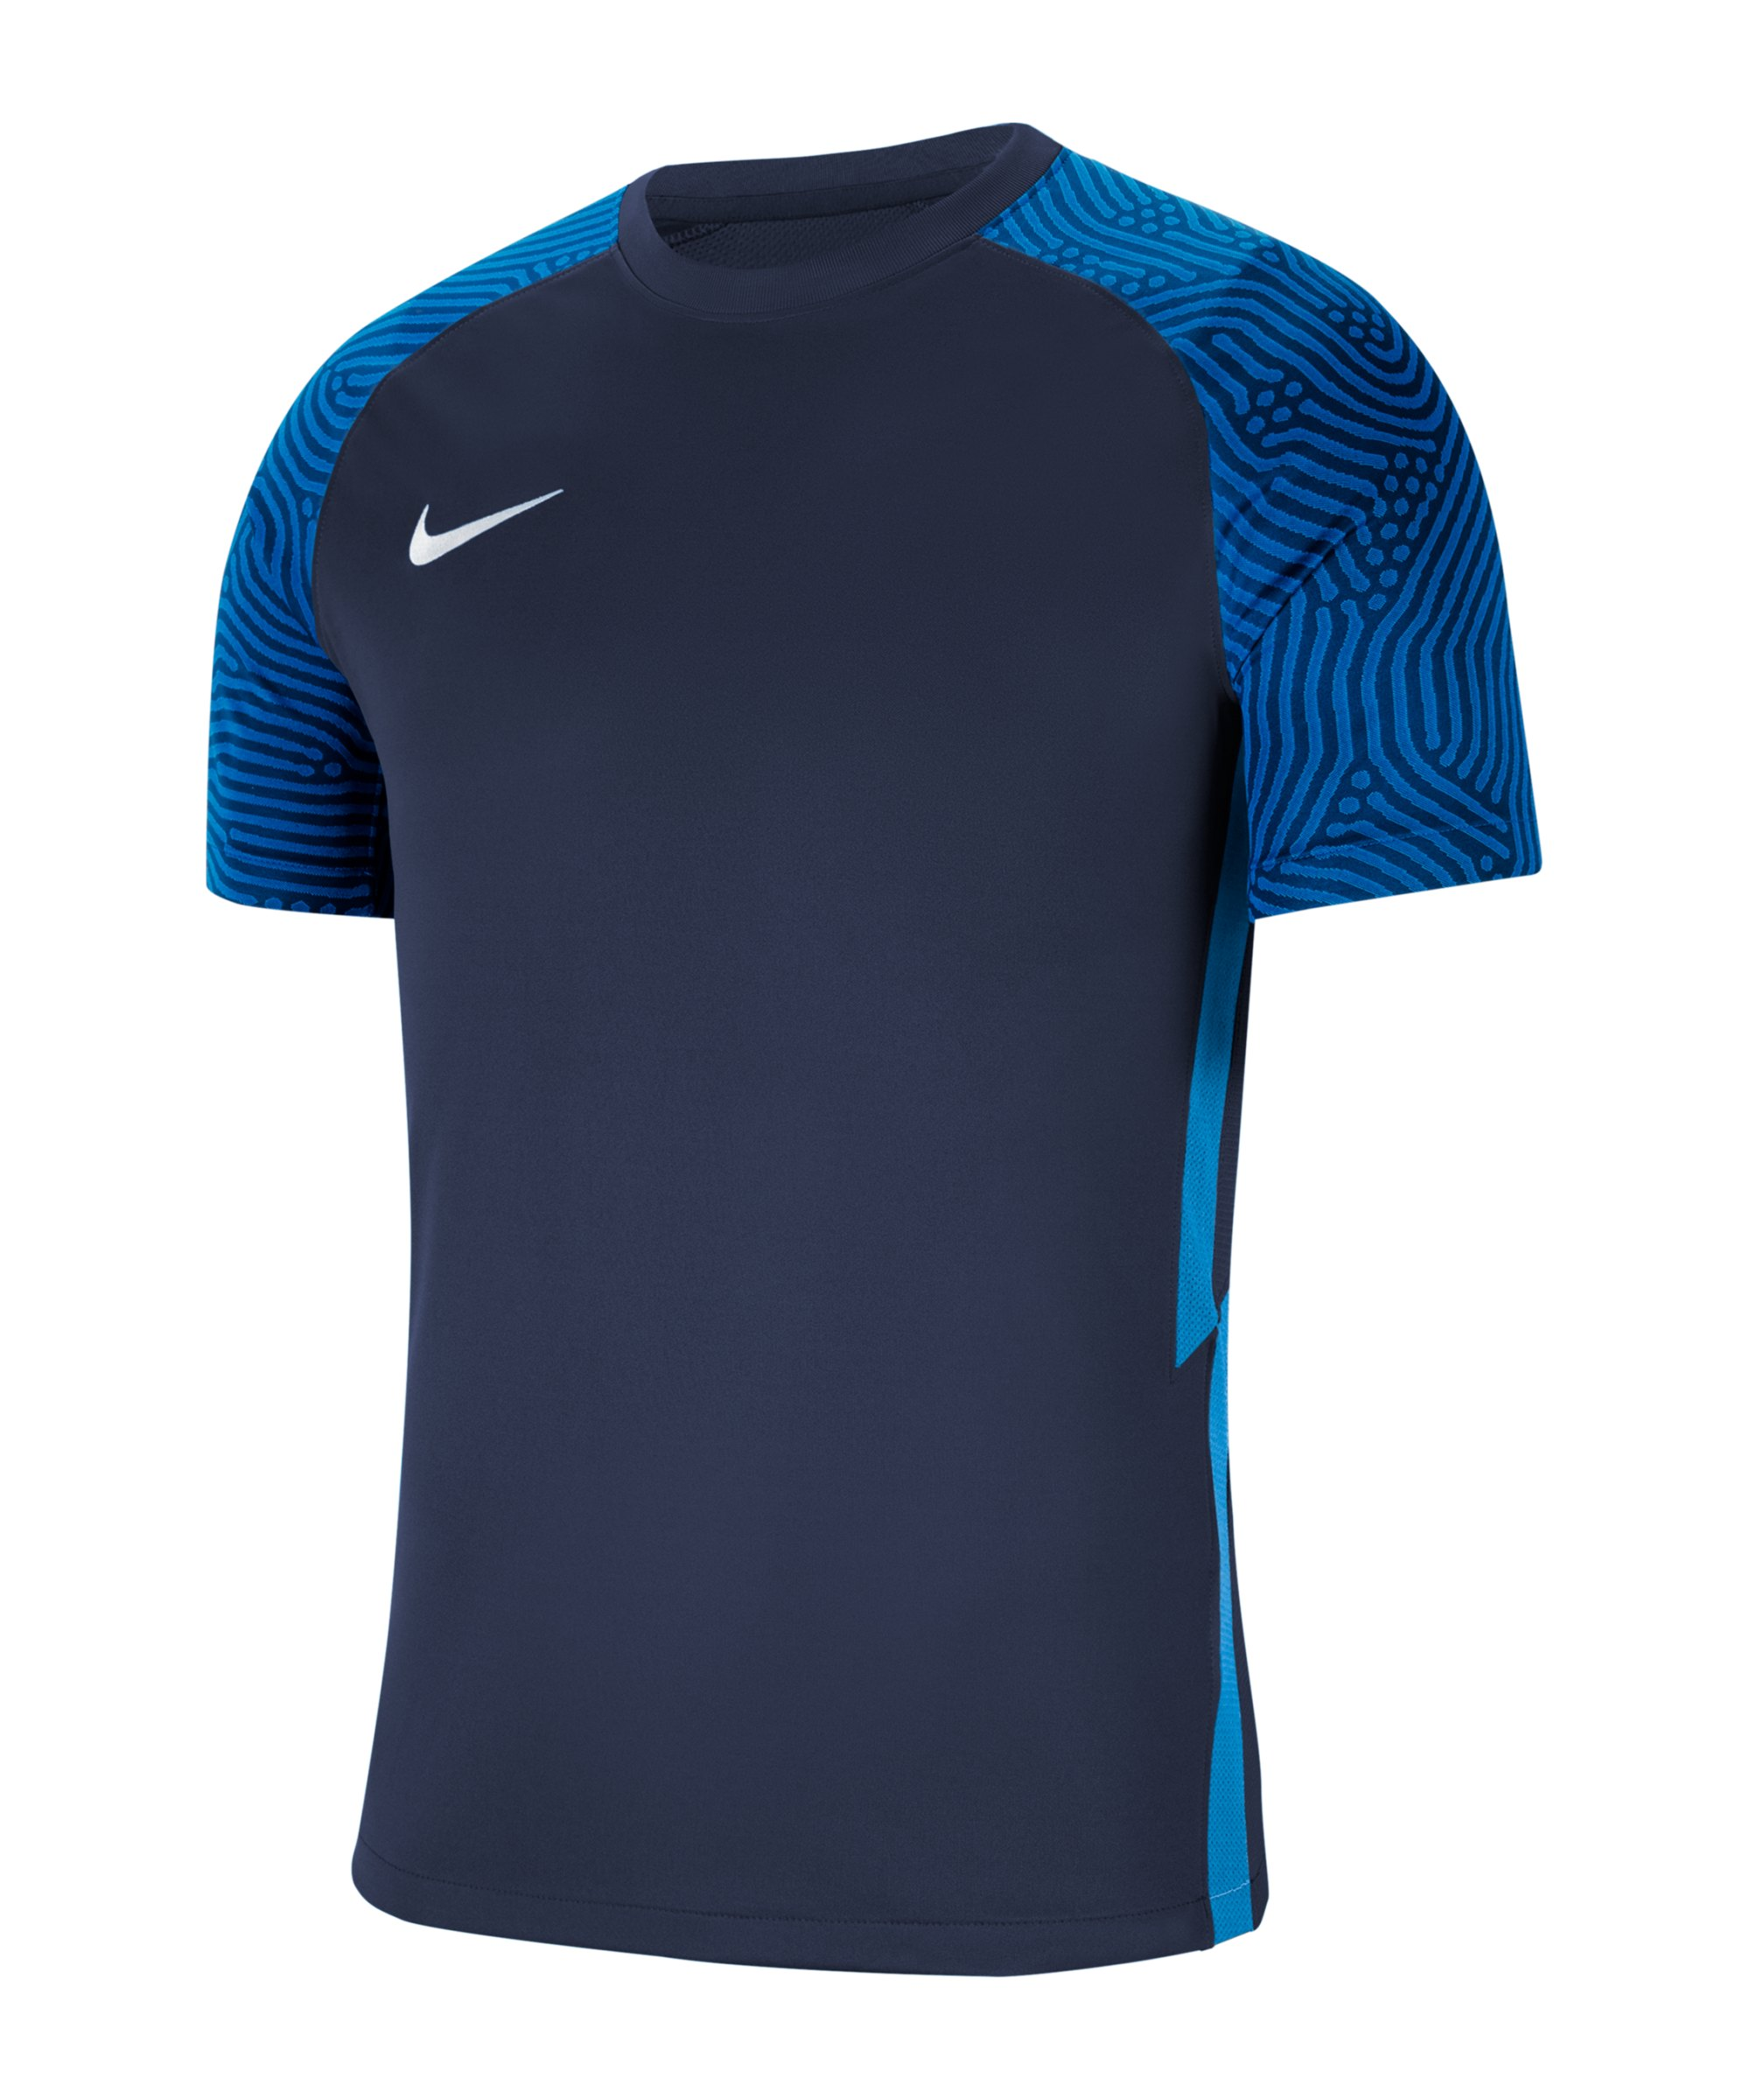 Nike Strike II Trikot kurzarm Kids Blau Weiss F410 - blau